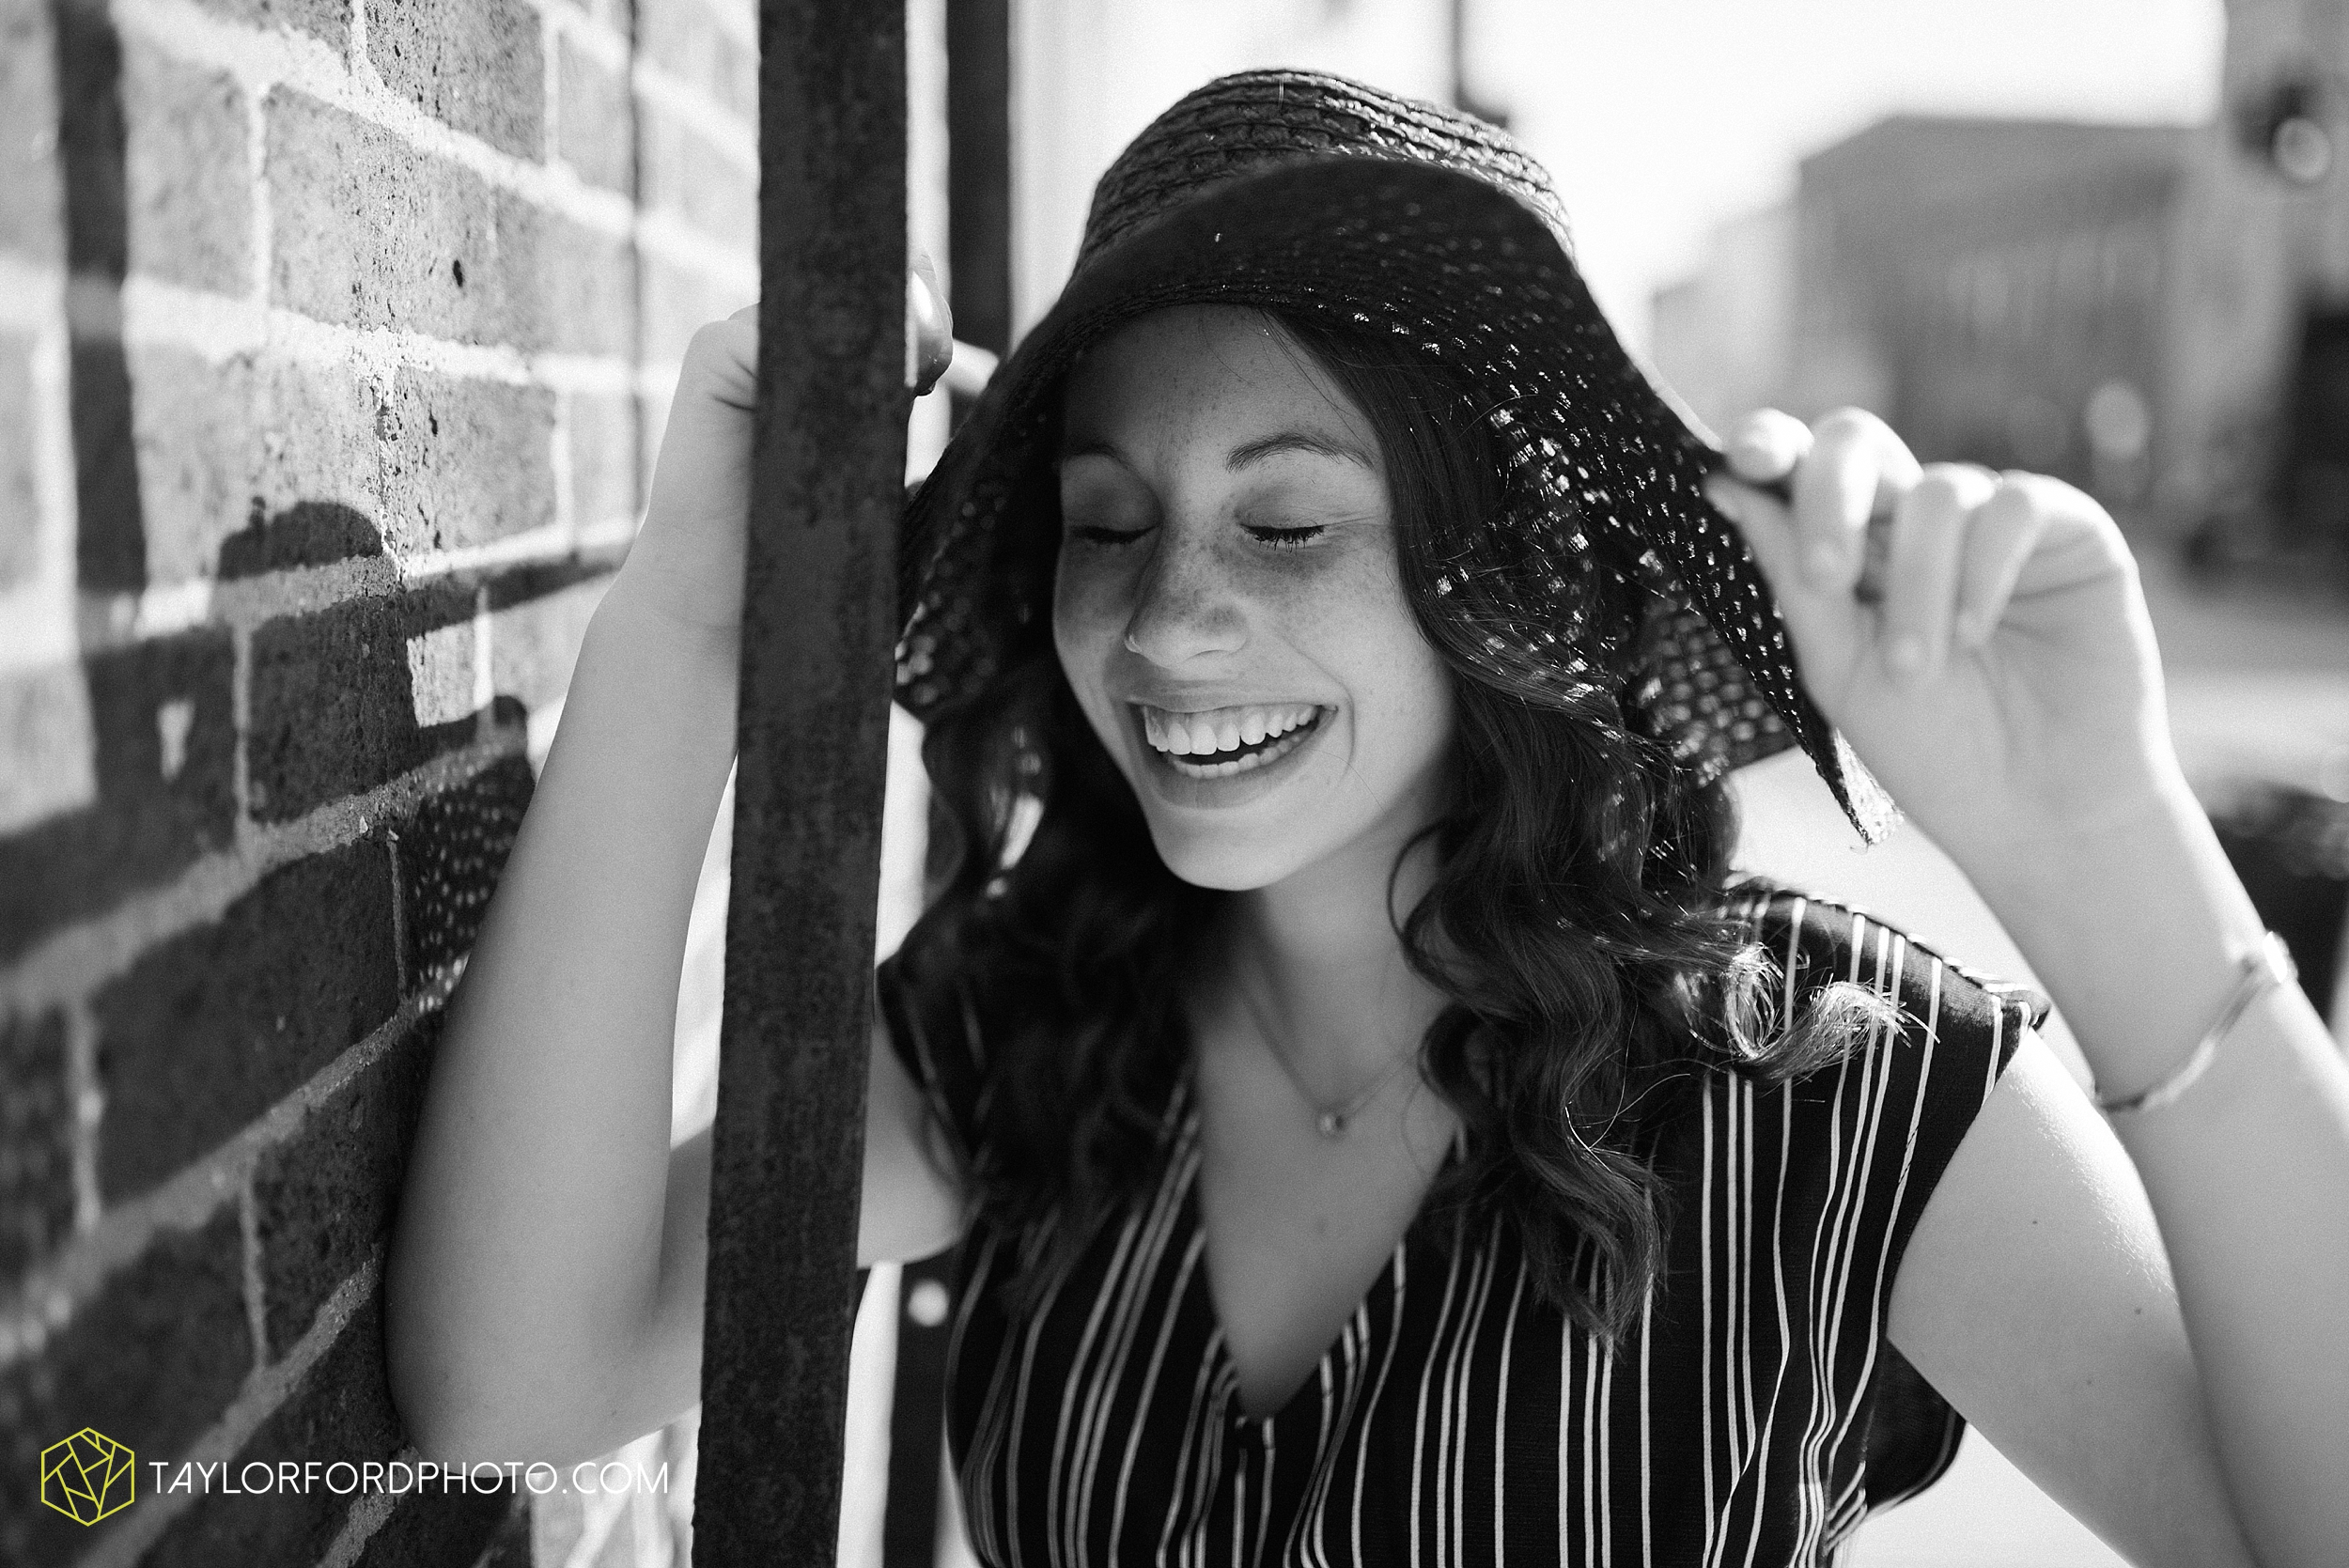 van-wert-high-school-ohio-senior-girl-downtown-cougar-photographer-taylor-ford-photography_0924.jpg